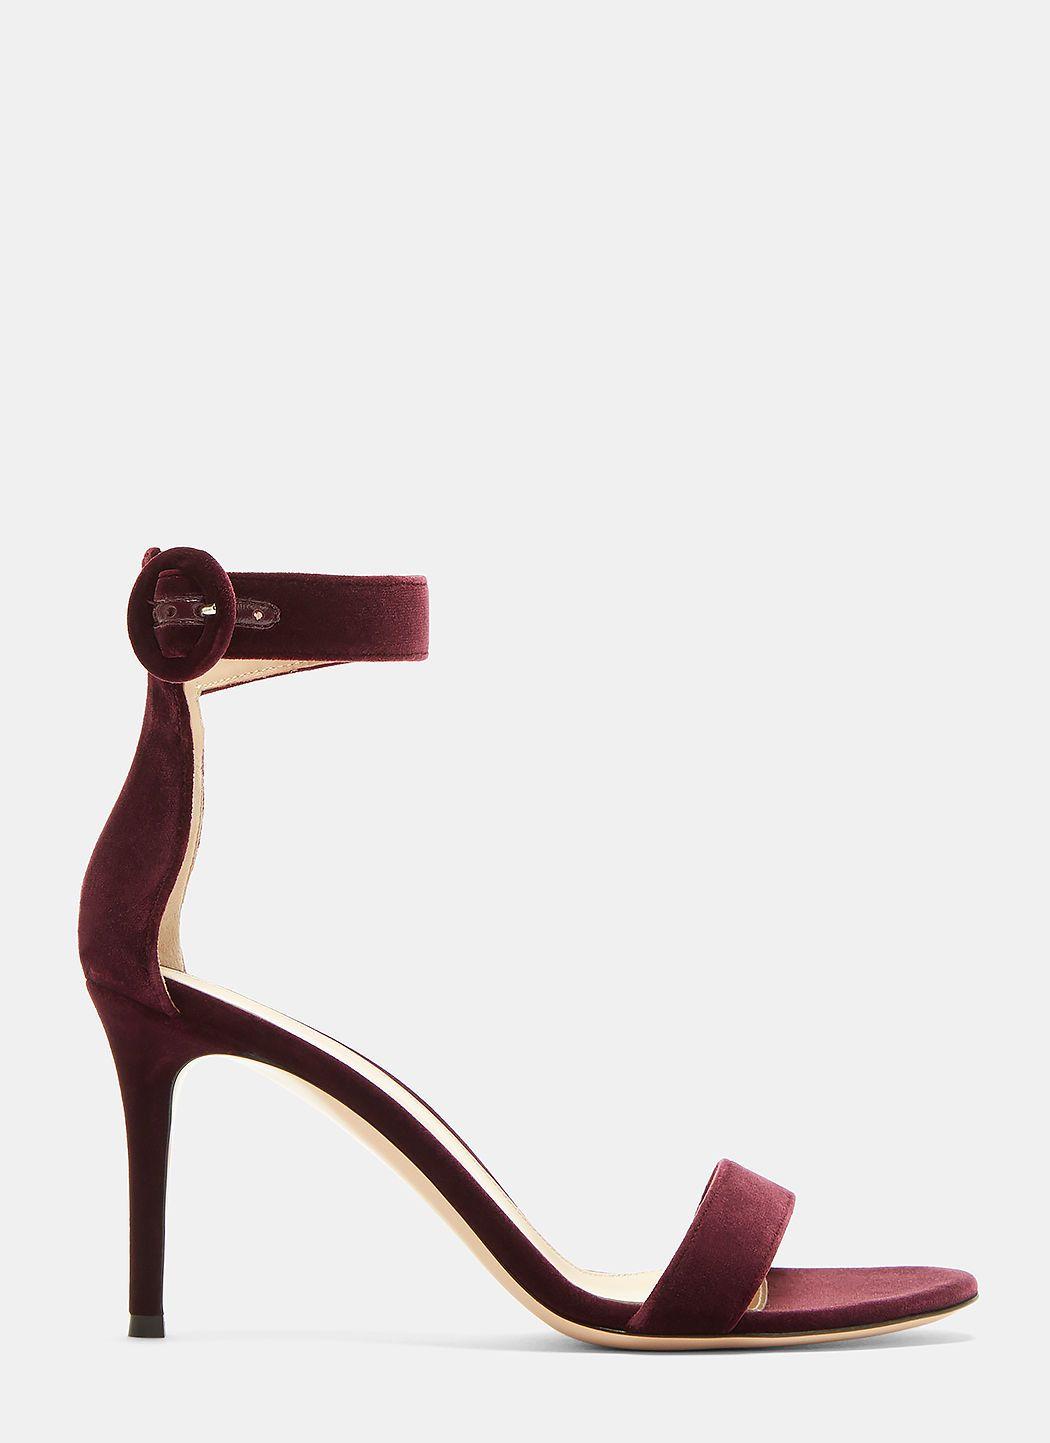 Gianvito Rossi Portofino 85 Velvet Heeled Sandals In Purple Modesens Velvet Heels Sandals Heels Heels